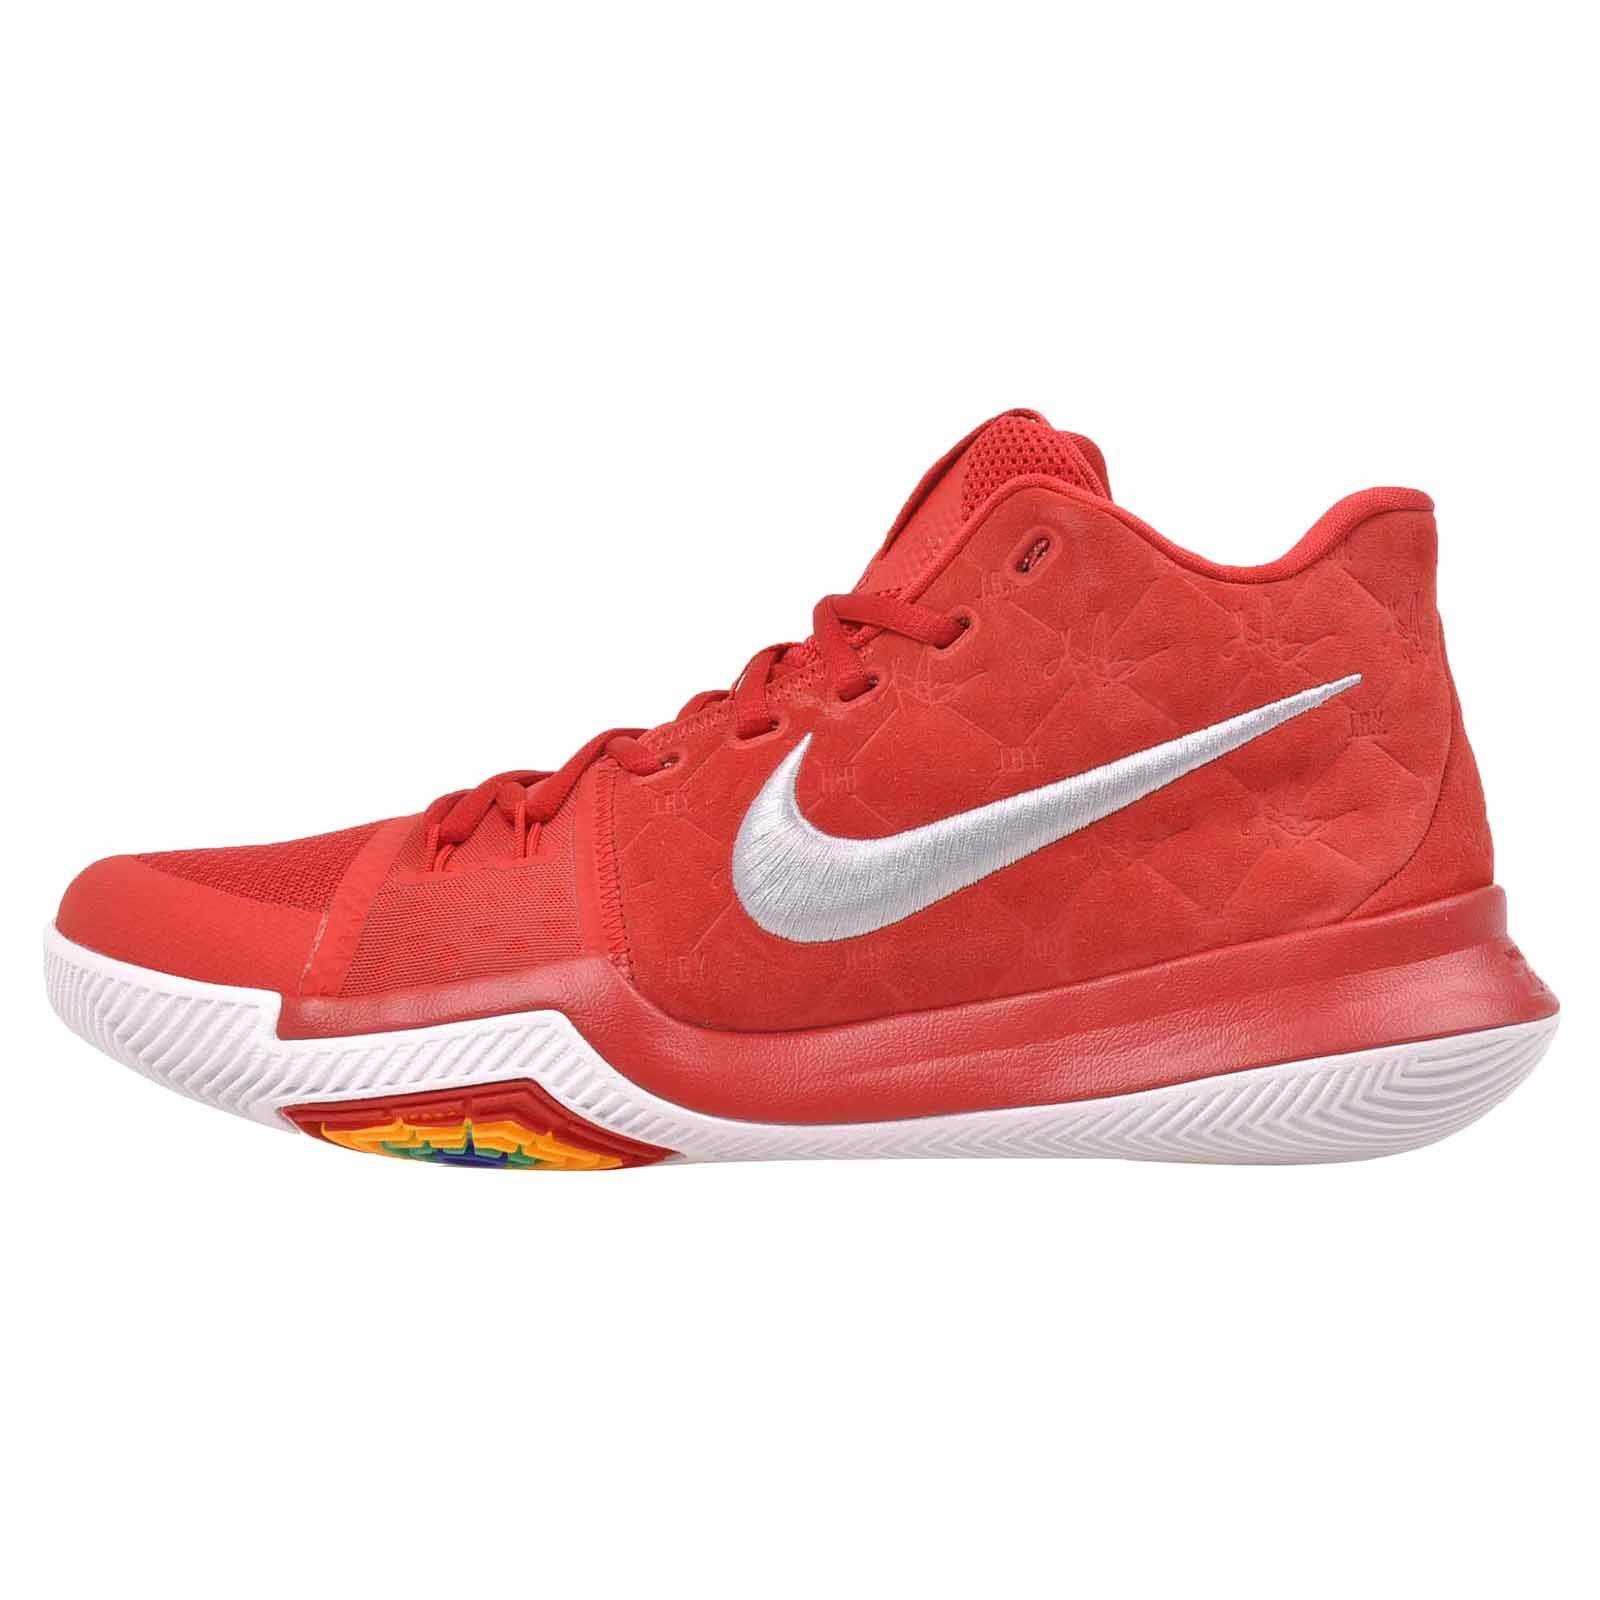 4da8604cde9c3 Nike Unisex Kyrie Flytrap Basketball Shoes (12 M US, University  Red/University Red)